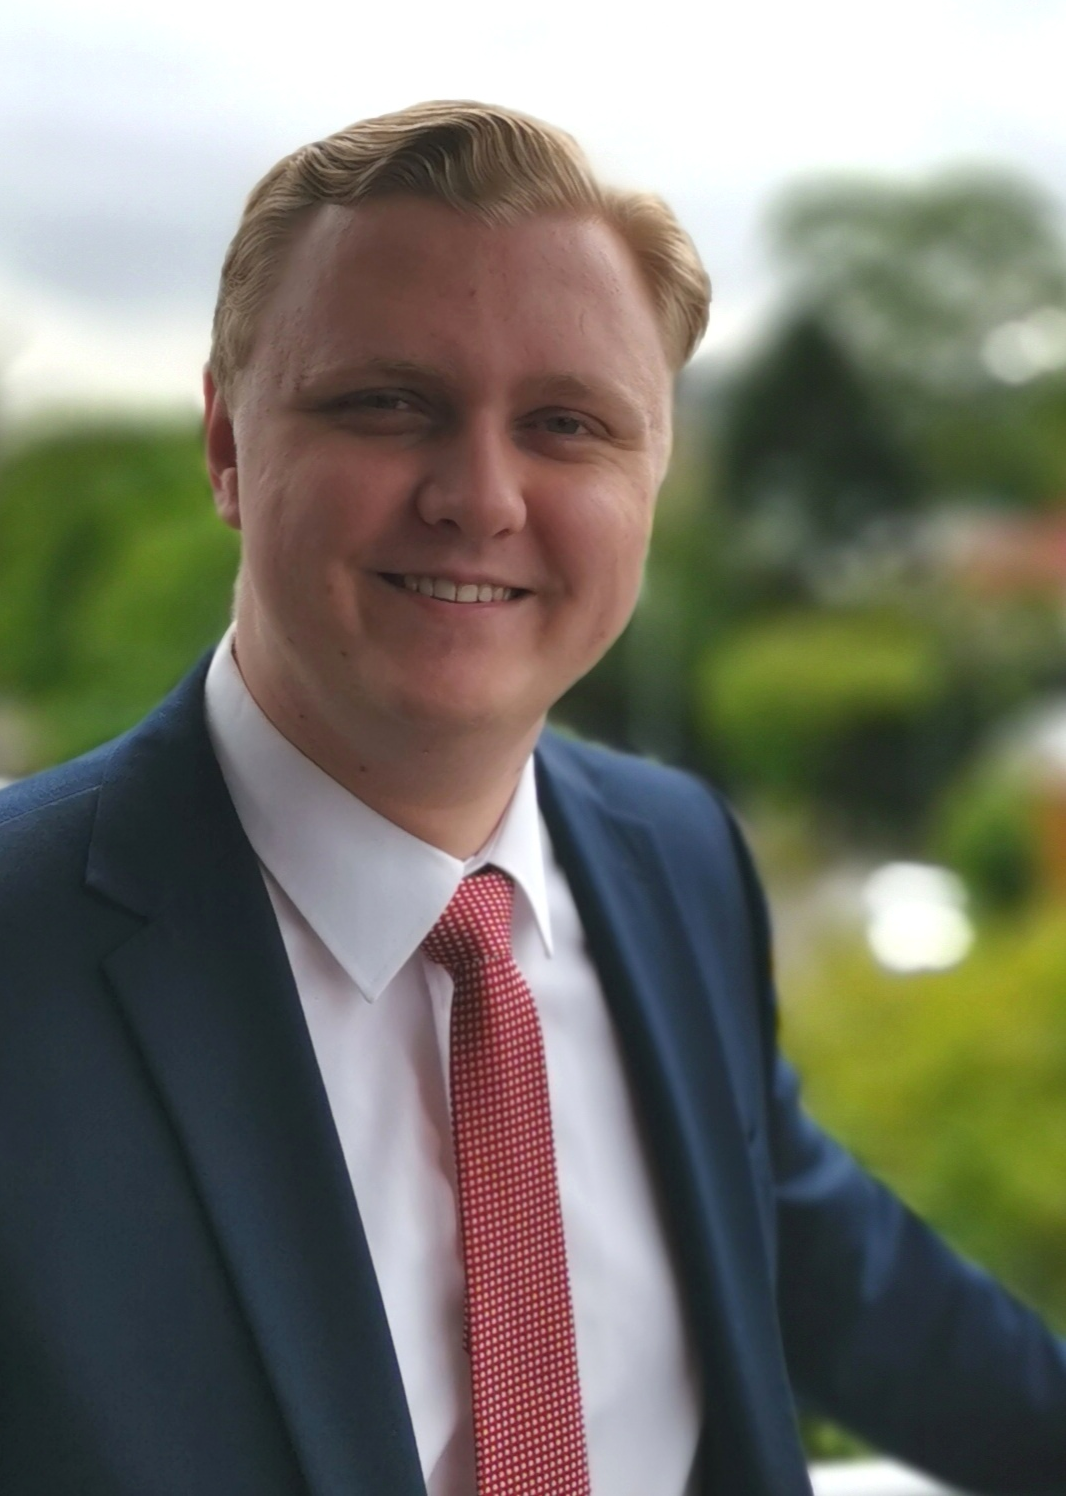 Qld - Thomas Wealleans Profile Headshot.png